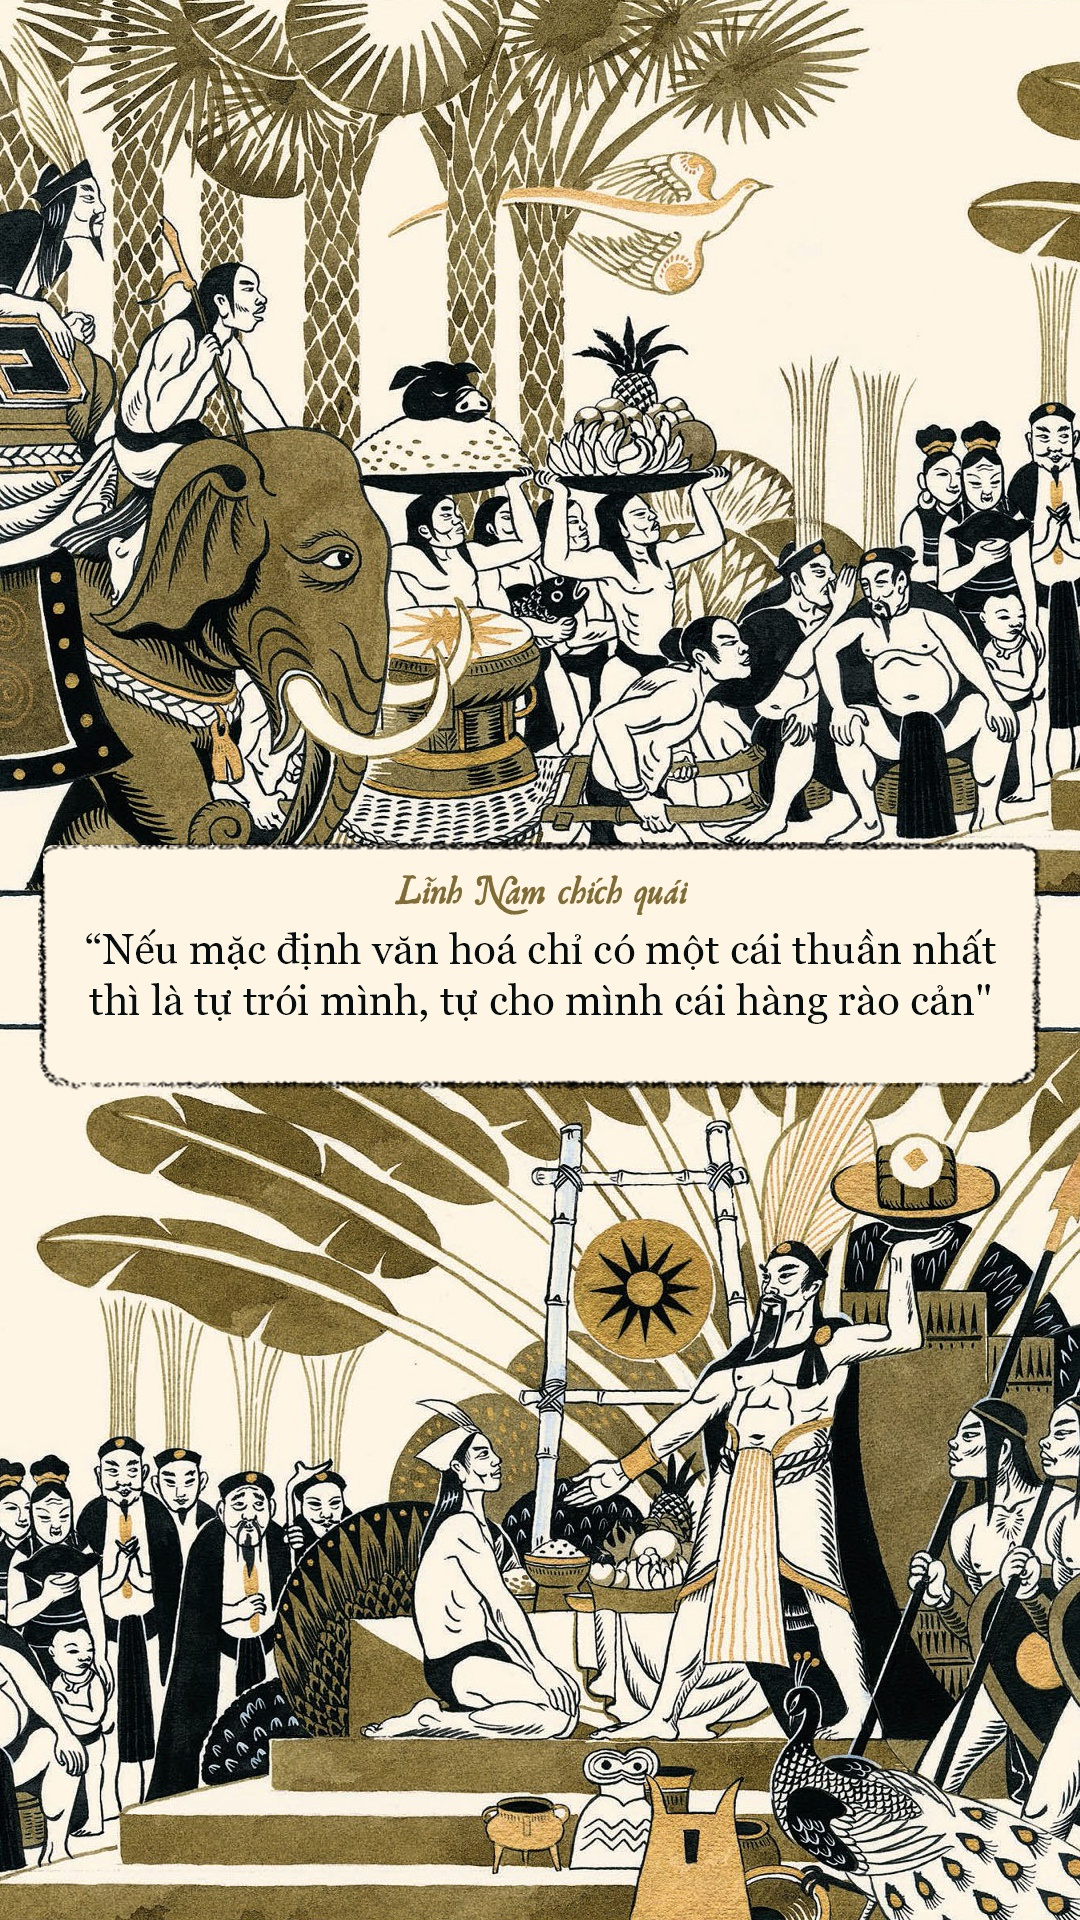 Linh Nam chich quai,  Ta Huy Long,  Art Book anh 13